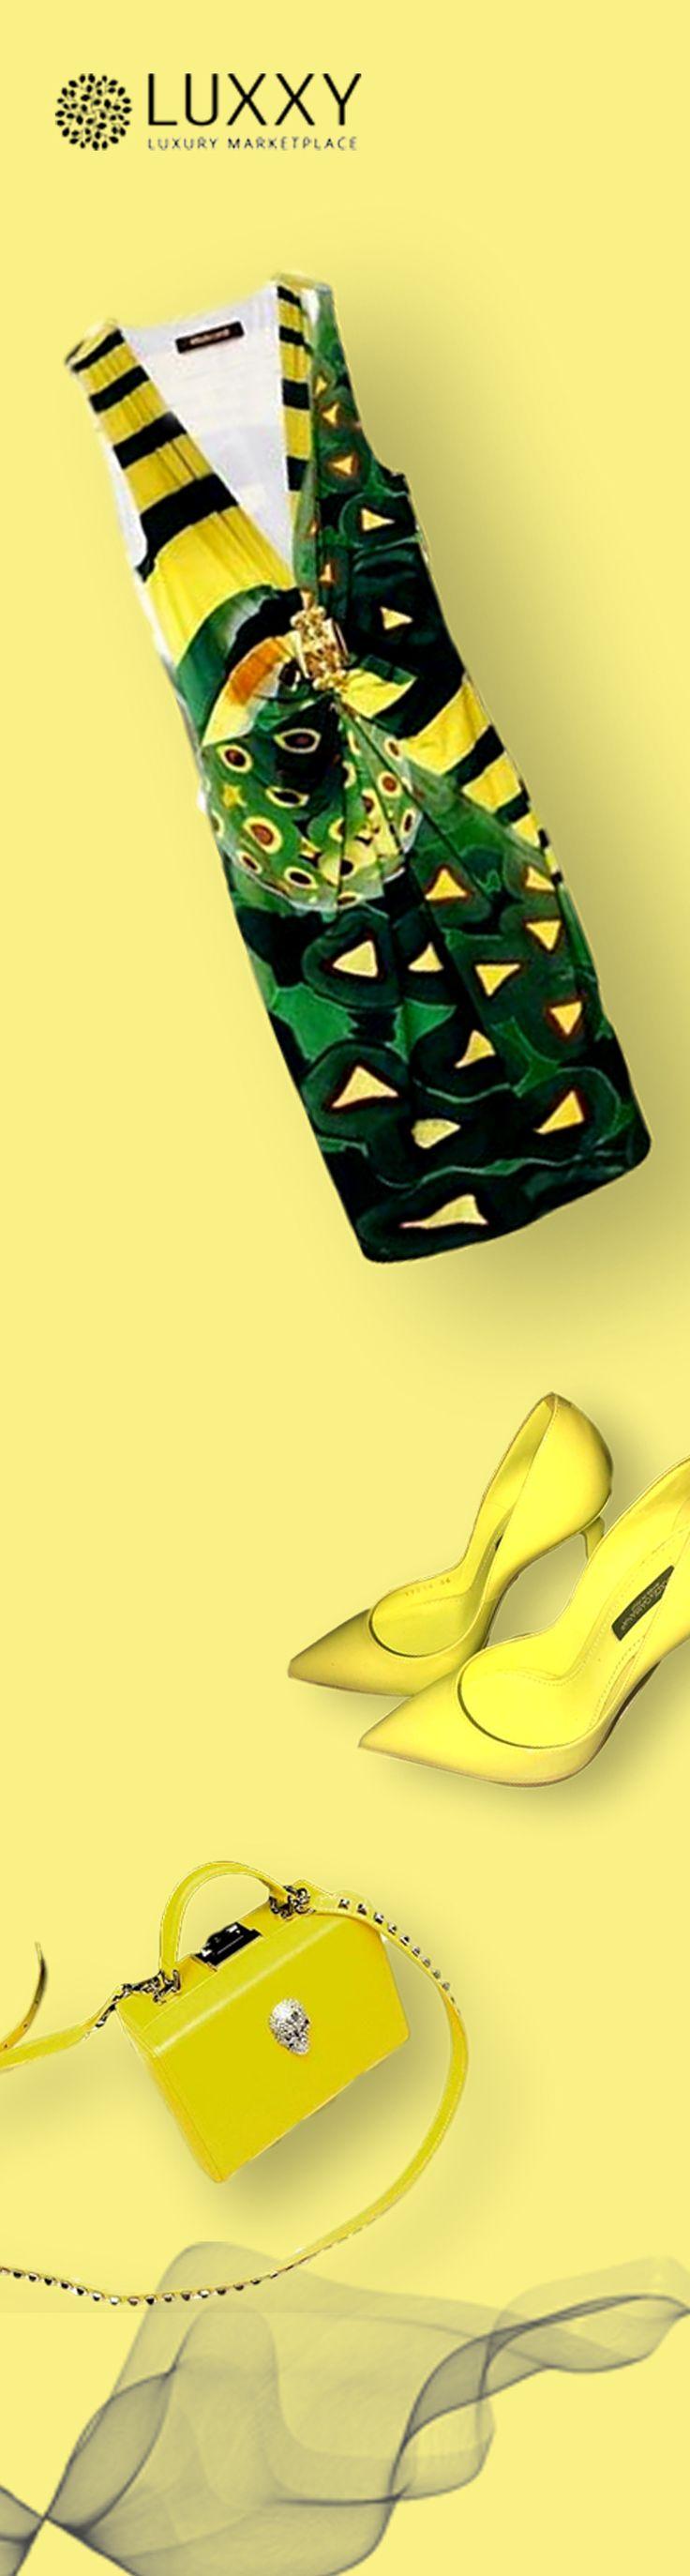 платье Roberto Cavalli, сумочка Philipp Plein и туфли Dolce & Gabbana  https://luxxy.com/ru/product/plata-roberto-cavalli-59342da7d988d/  https://luxxy.com/ru/product/malenkie-sumocki-philipp-plein-59218f80aac4a/  https://luxxy.com/ru/product/tufli-dolce-gabbana-59187965214b6/